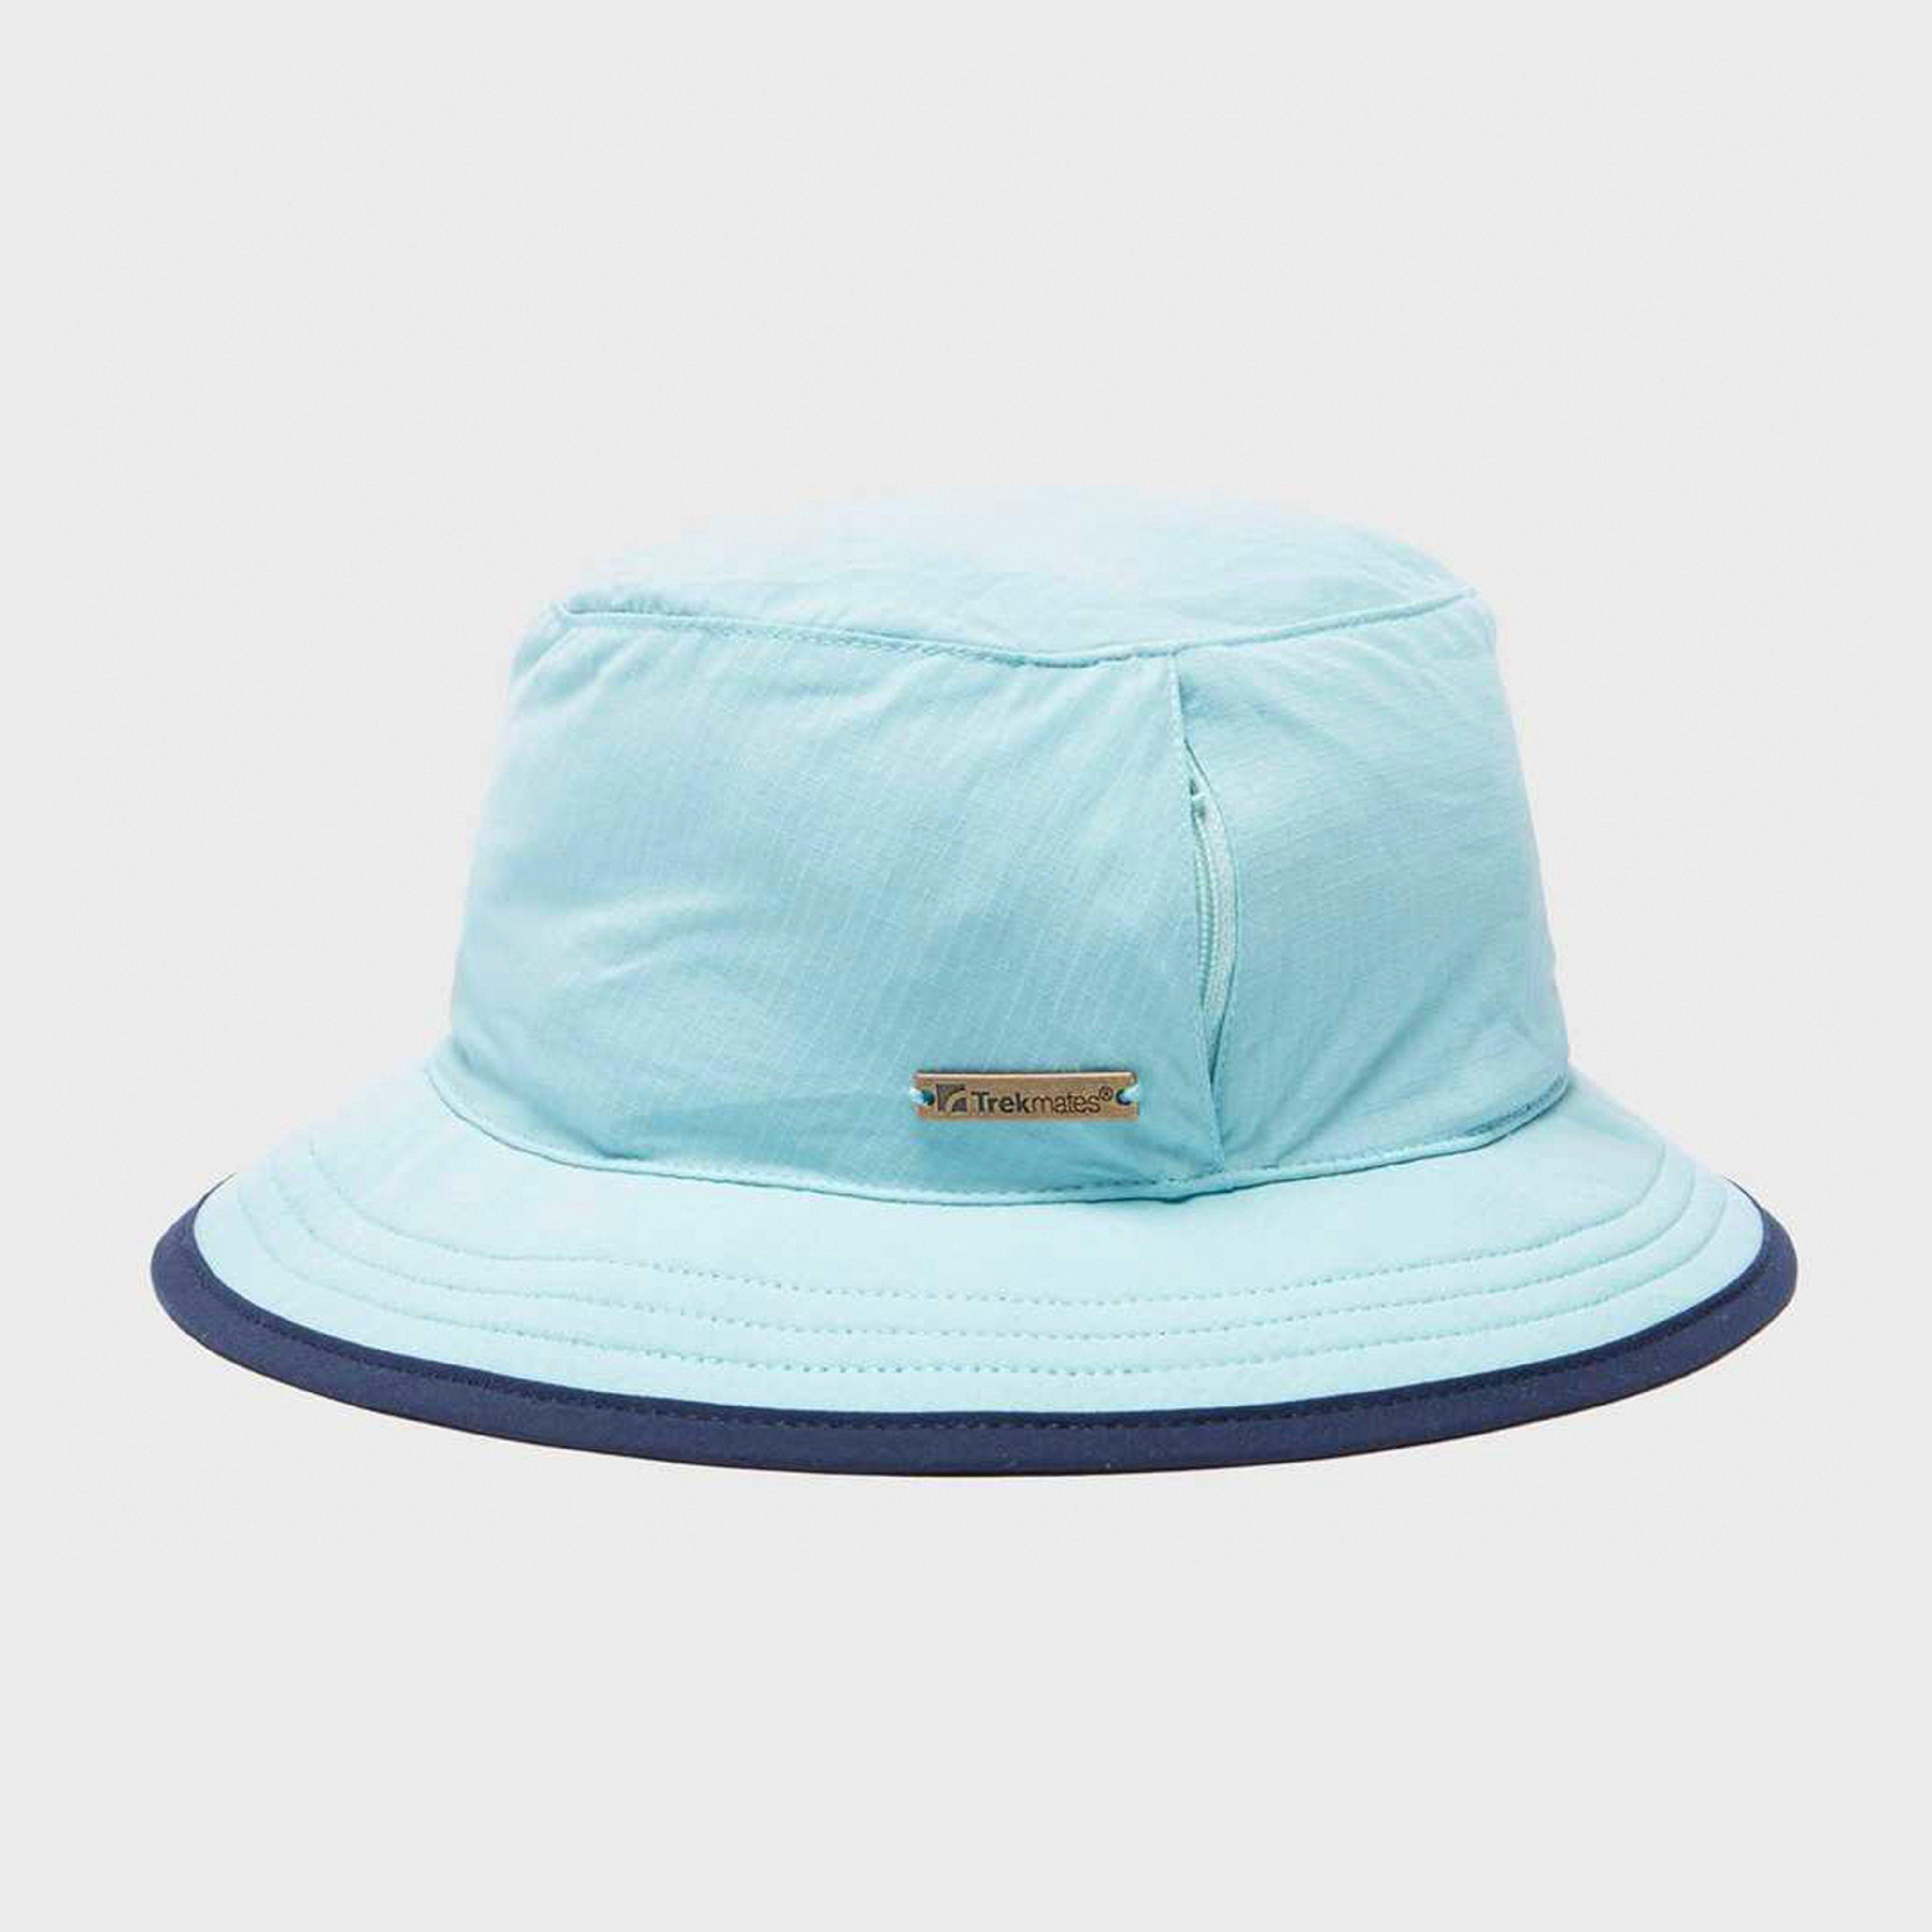 Trekmates Trekmates Womens Ordos Hat - Turquoise, Turquoise